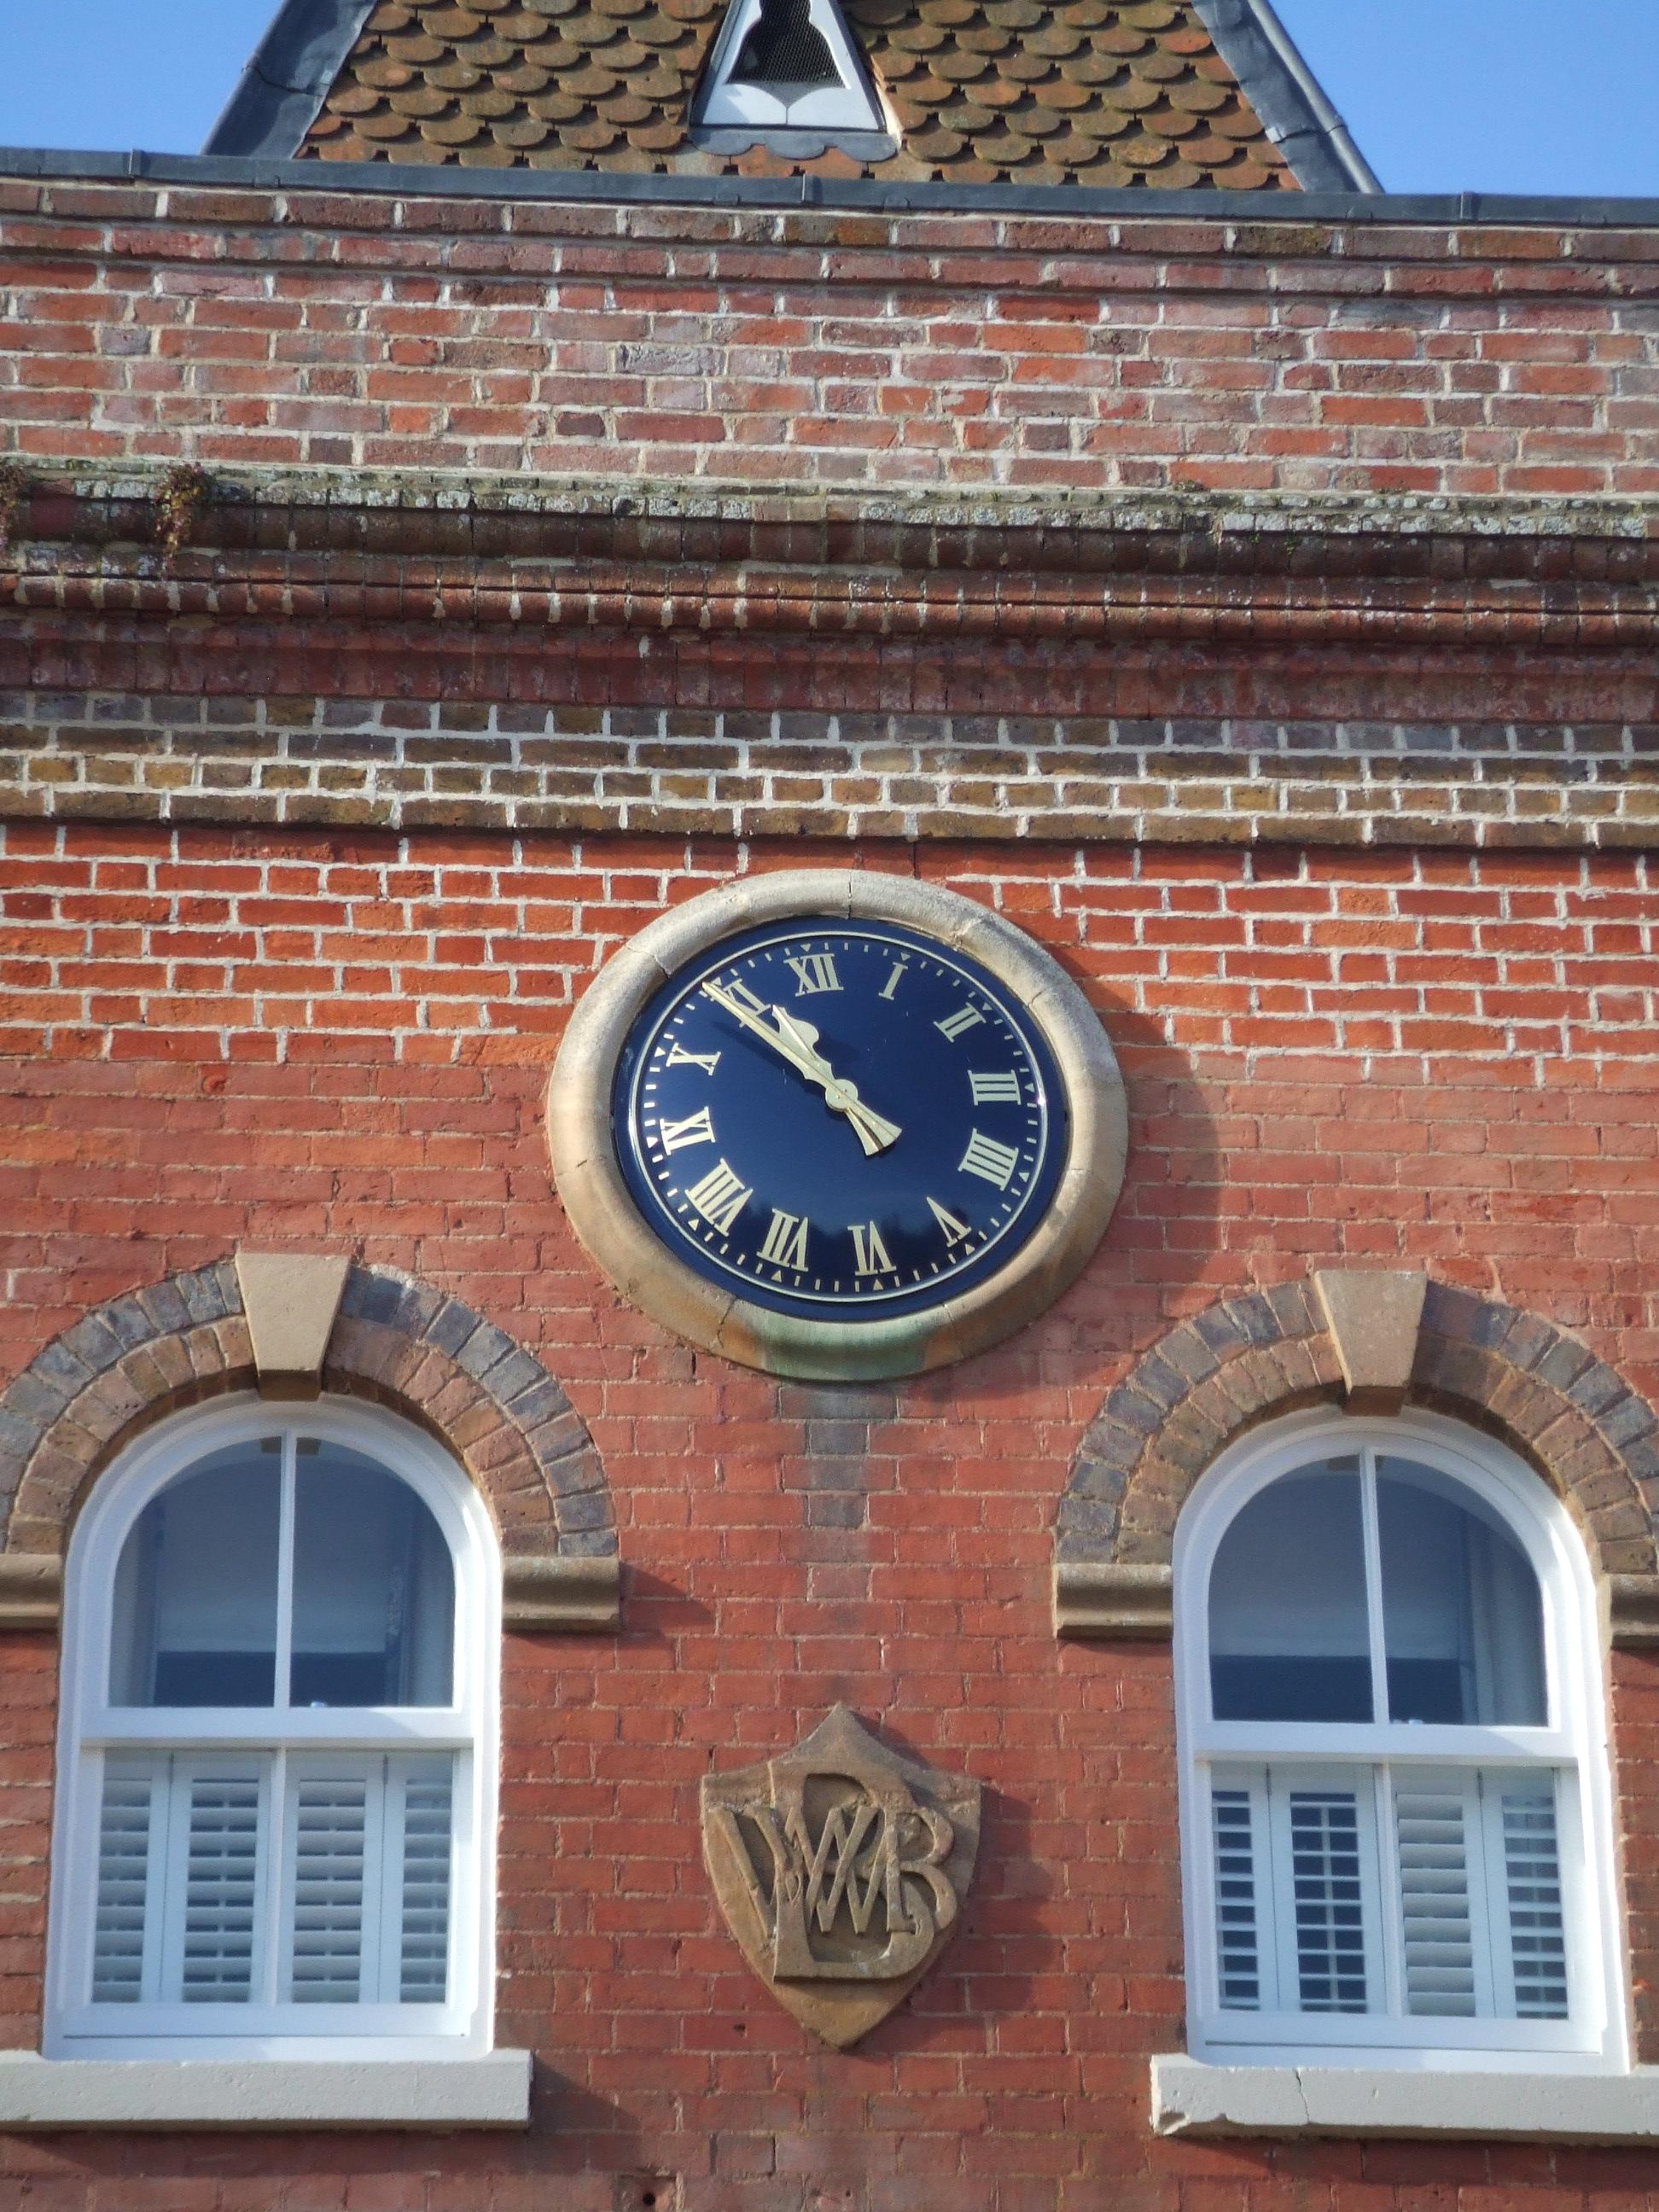 Black and gold clock in bullseye